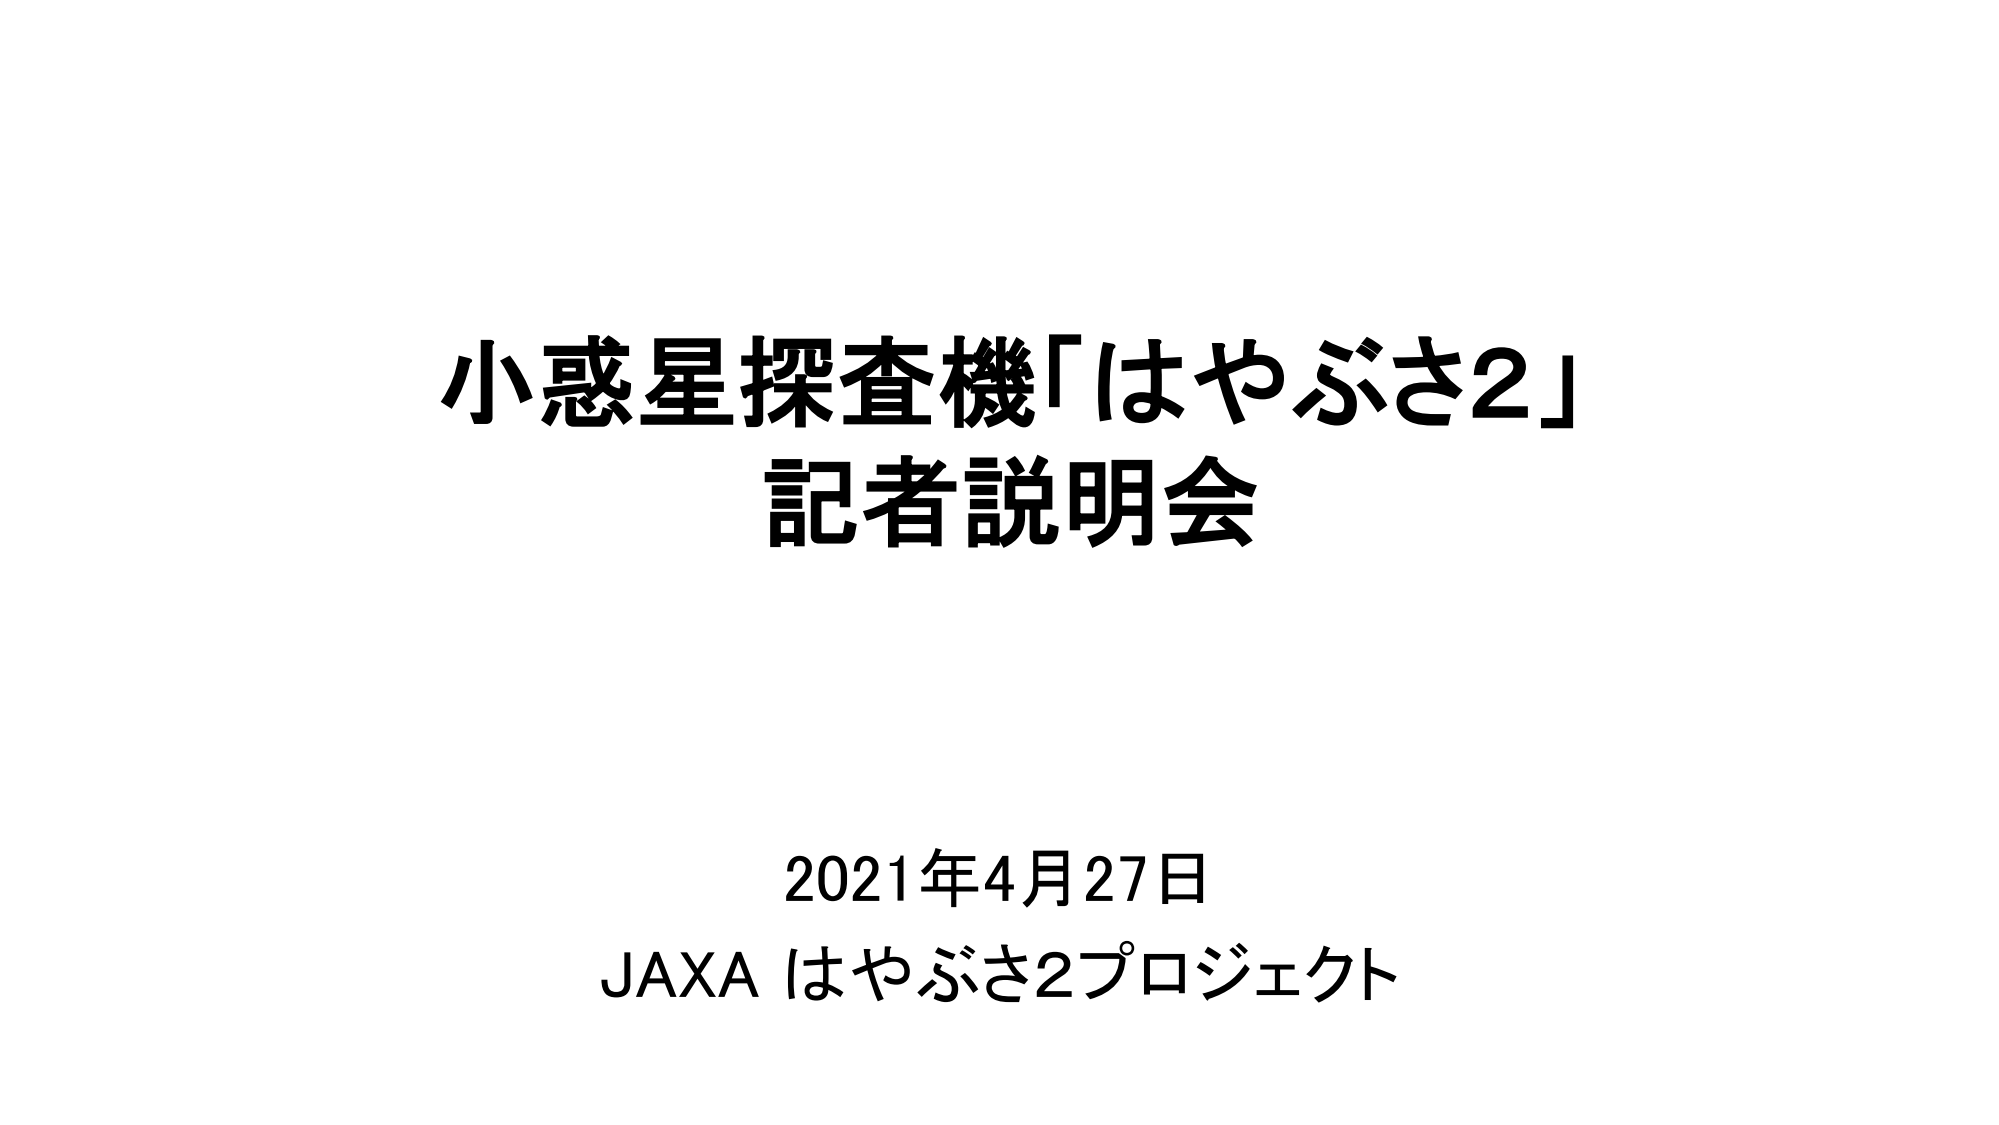 f:id:Imamura:20210427135050p:plain